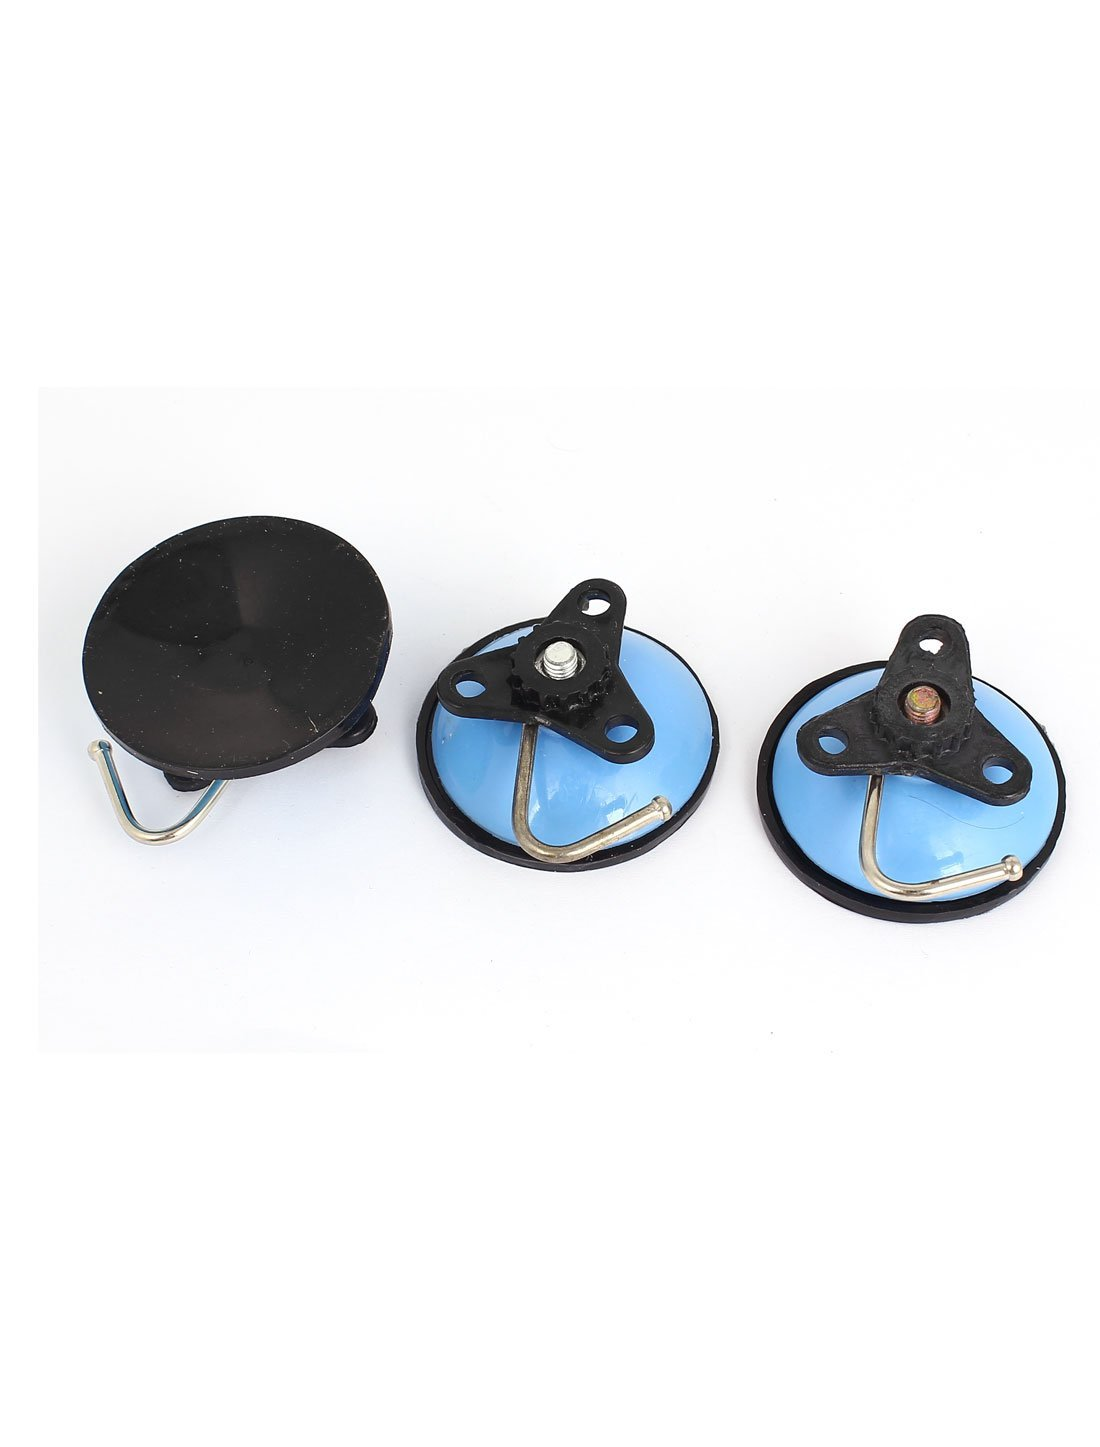 Amazon.com: eDealMax Vacío cocina ventosa ganchos Baño suspensión de la pared 3pcs Azul cian: Home & Kitchen